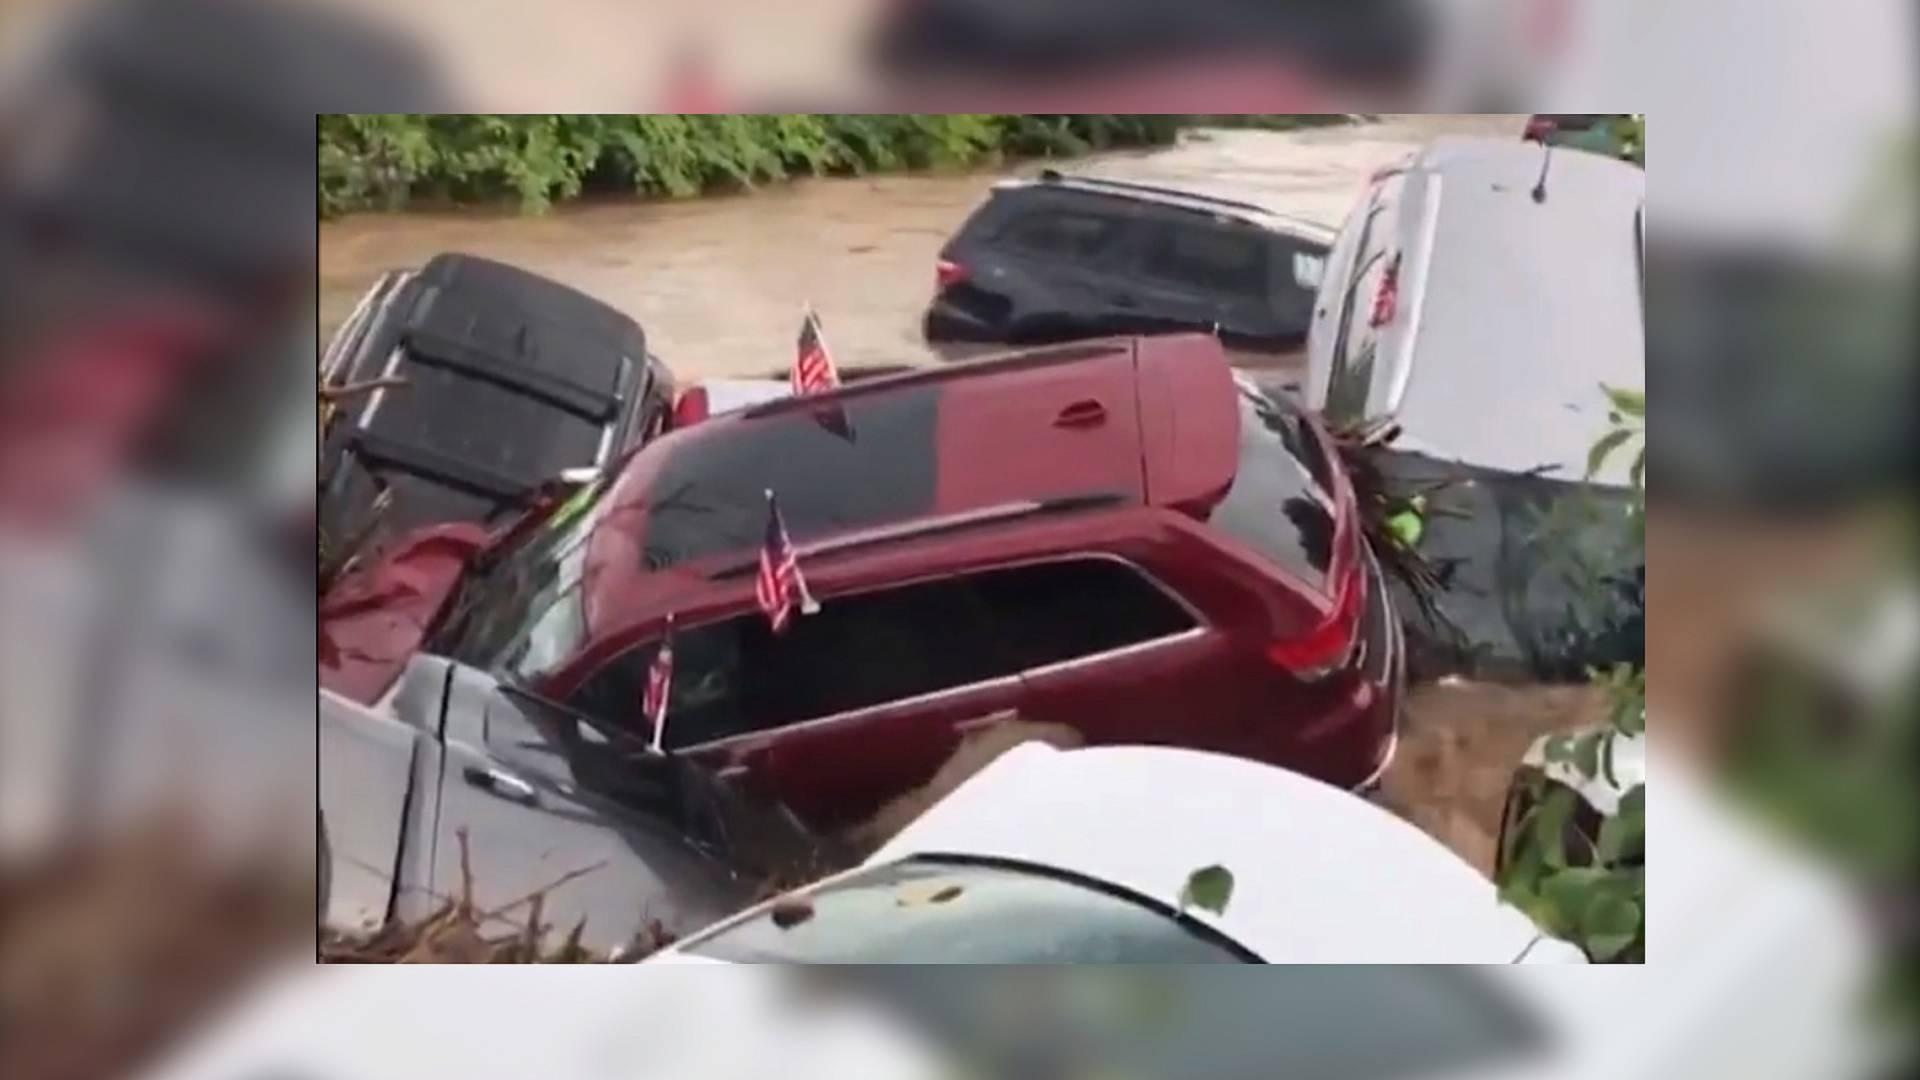 flash flood strikes dodge dealership, sweeps suvs into river